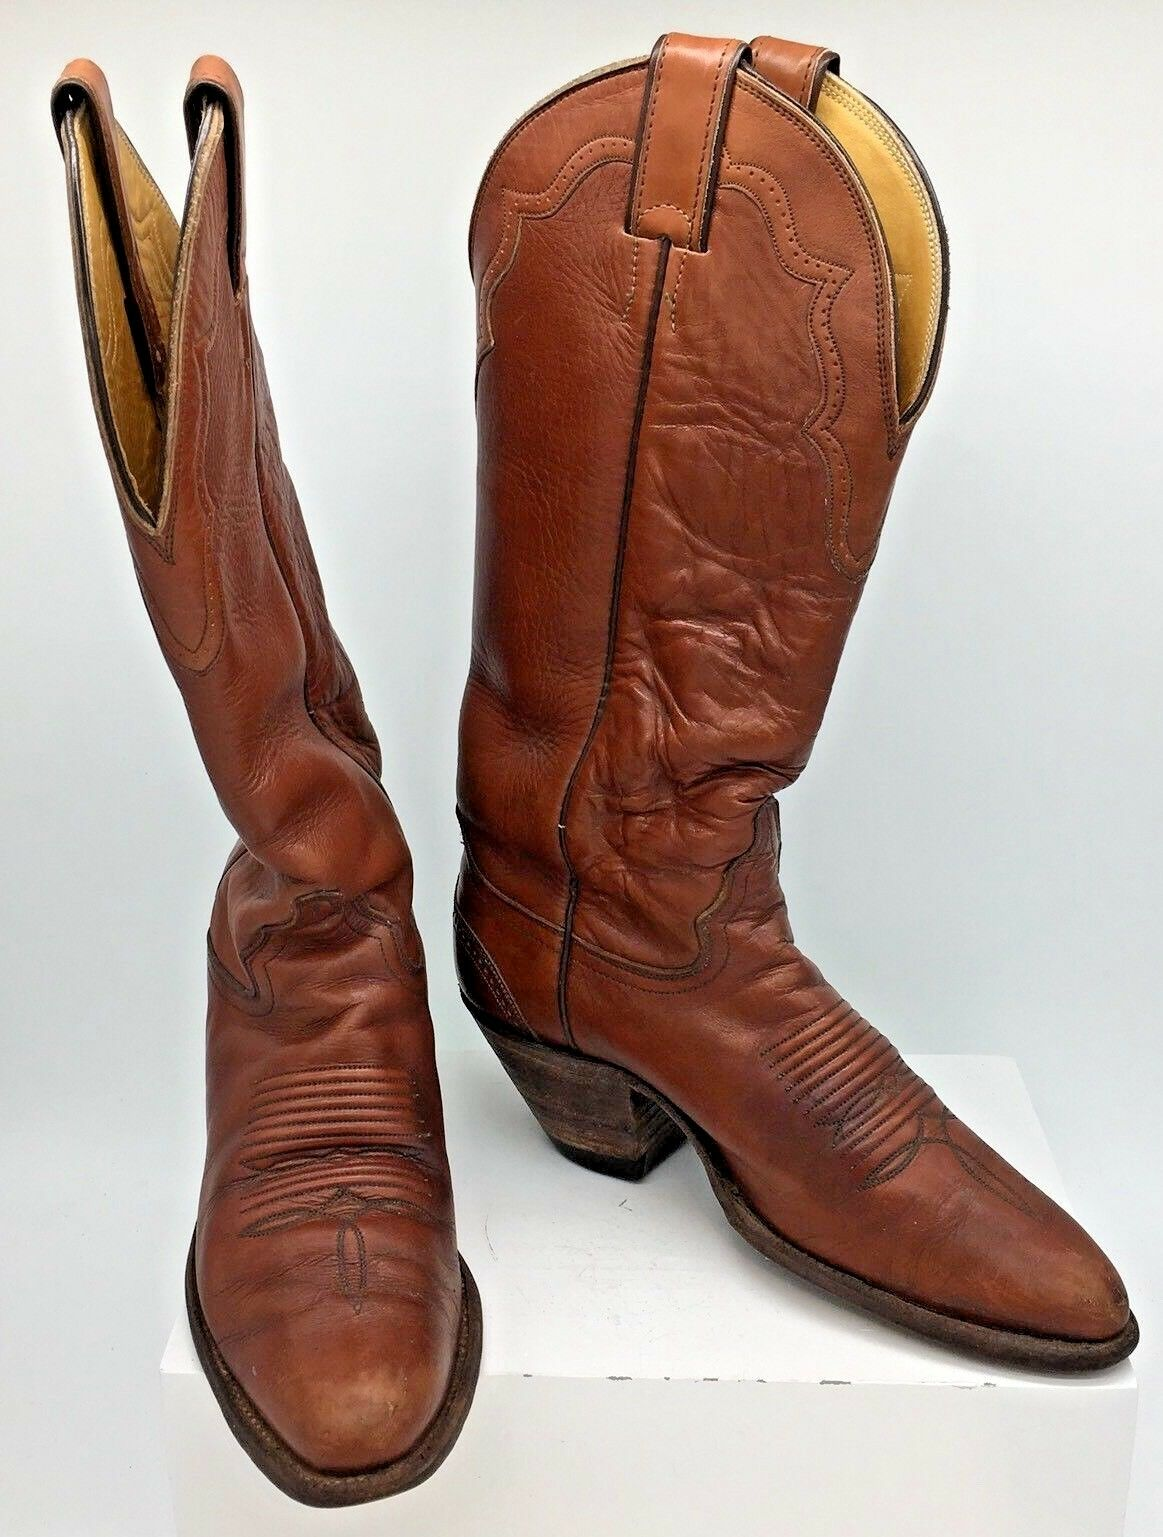 Vintage Justin Tall with Braun Leder Cowboy Stiefel with Tall Broguing Damenschuhe Sz 7B L4138 246a76